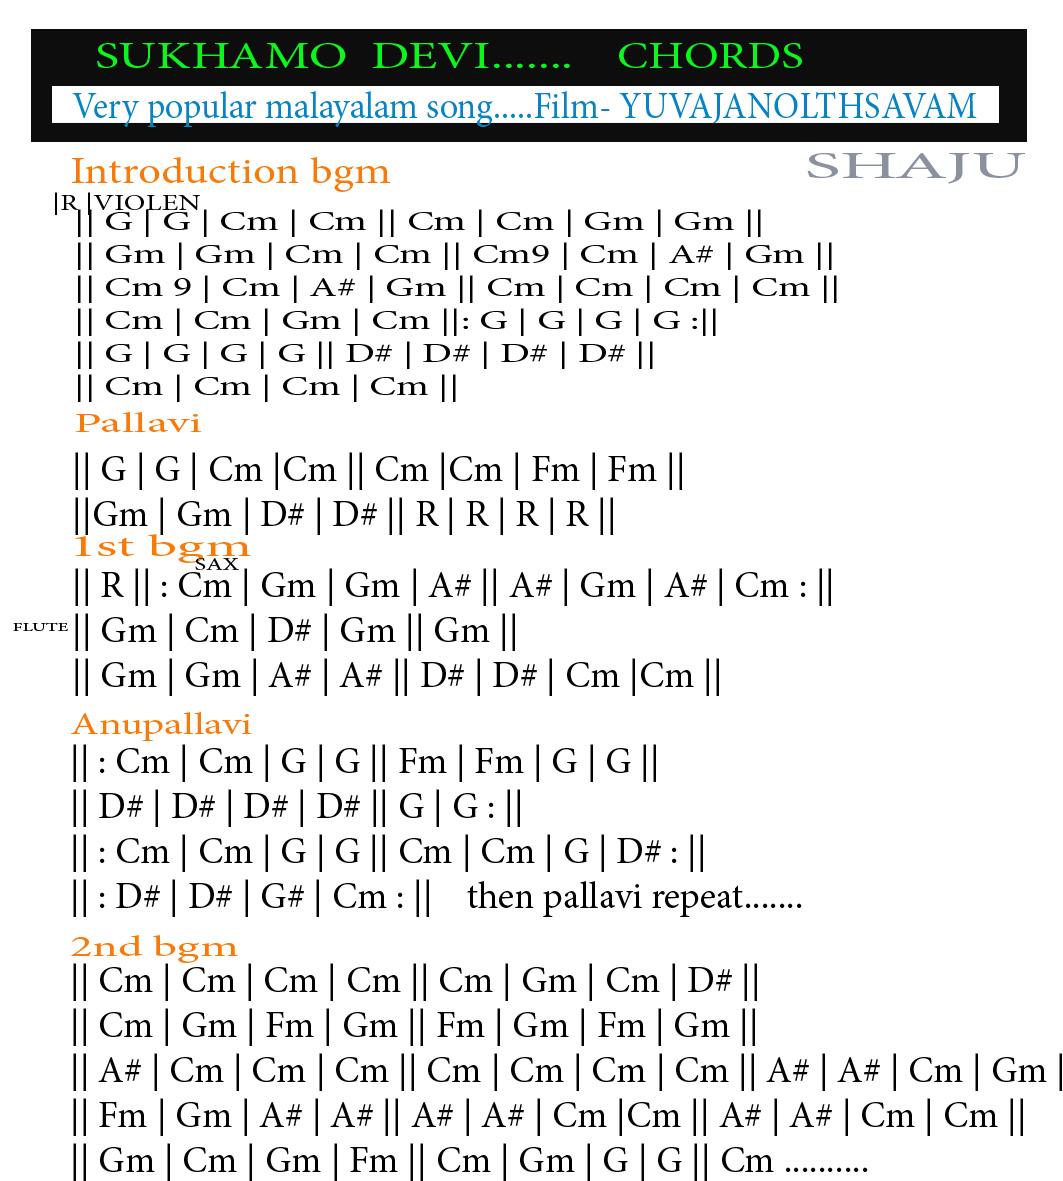 Shajuu0026#39;s Guitar Lessons: Sukhamo devi ...malayalam songu0026#39;s Chords